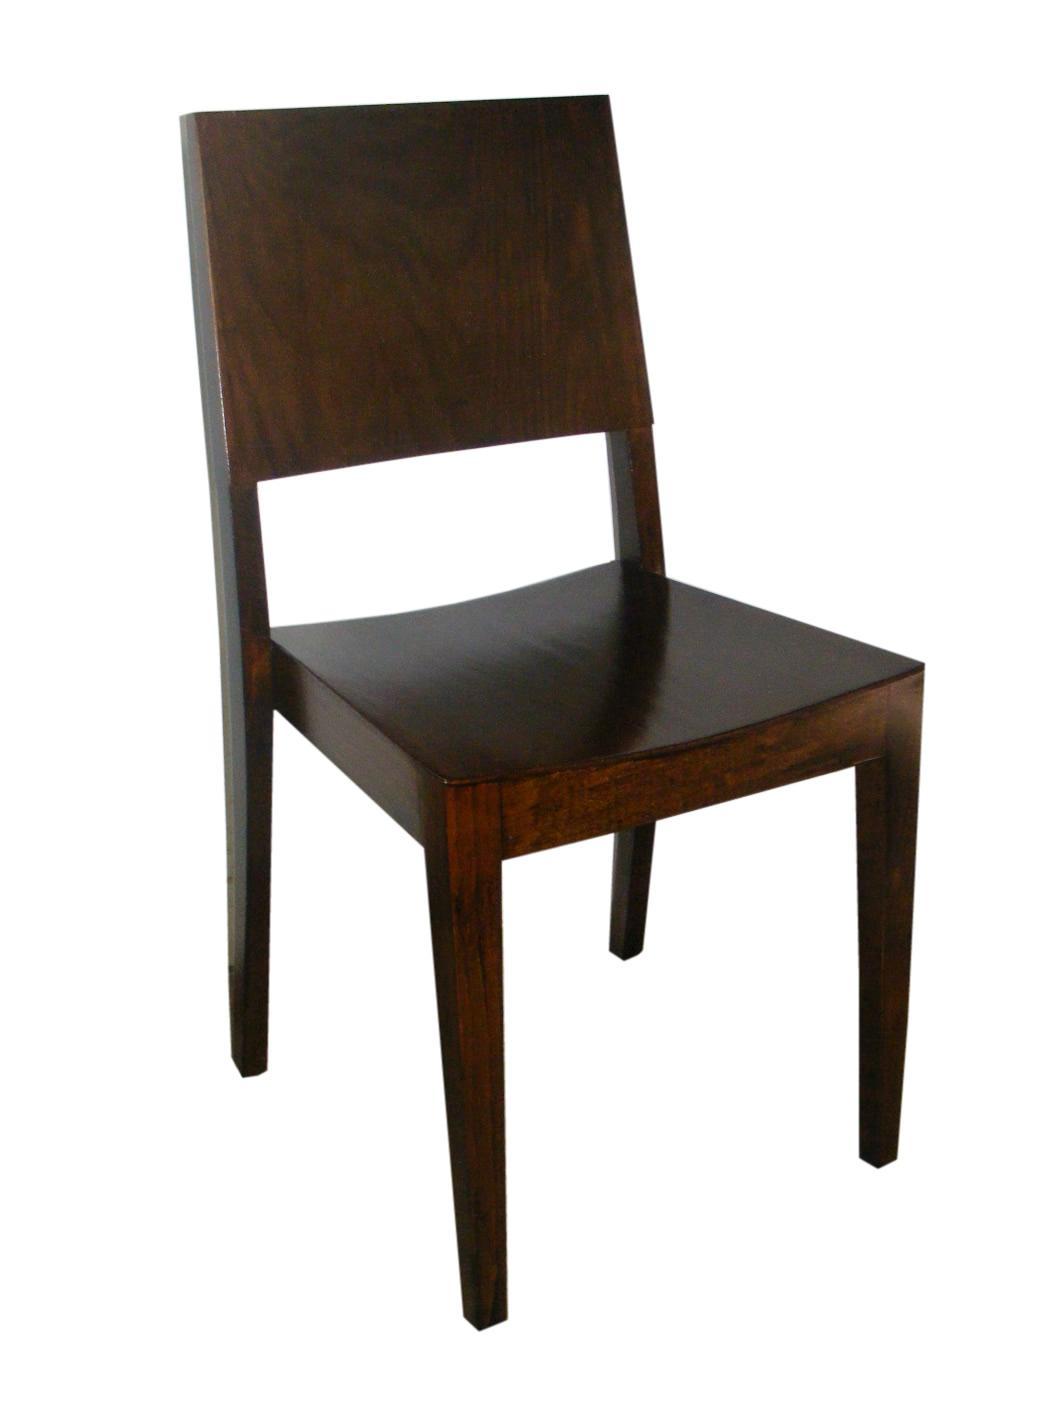 Sedie per Bar, Design, 300.0 - 1000.0 pezzi al mese